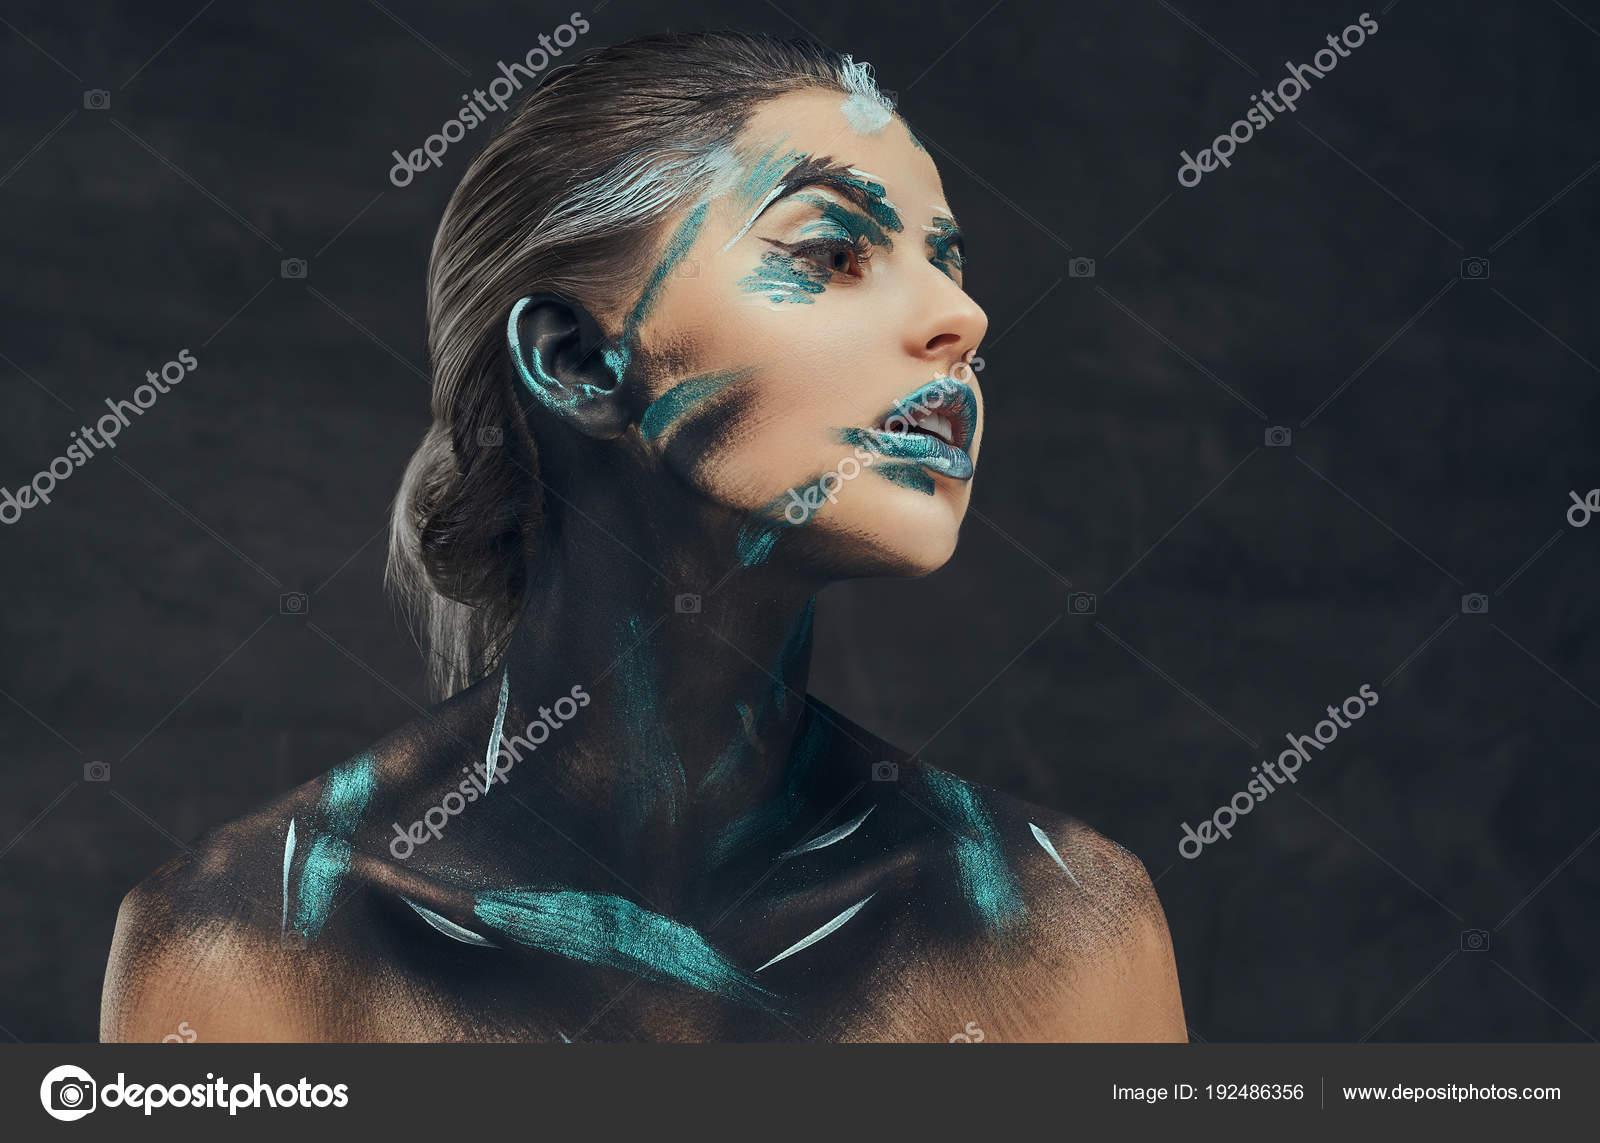 Пизда и лицо девушки на одном фото Частное фото 83